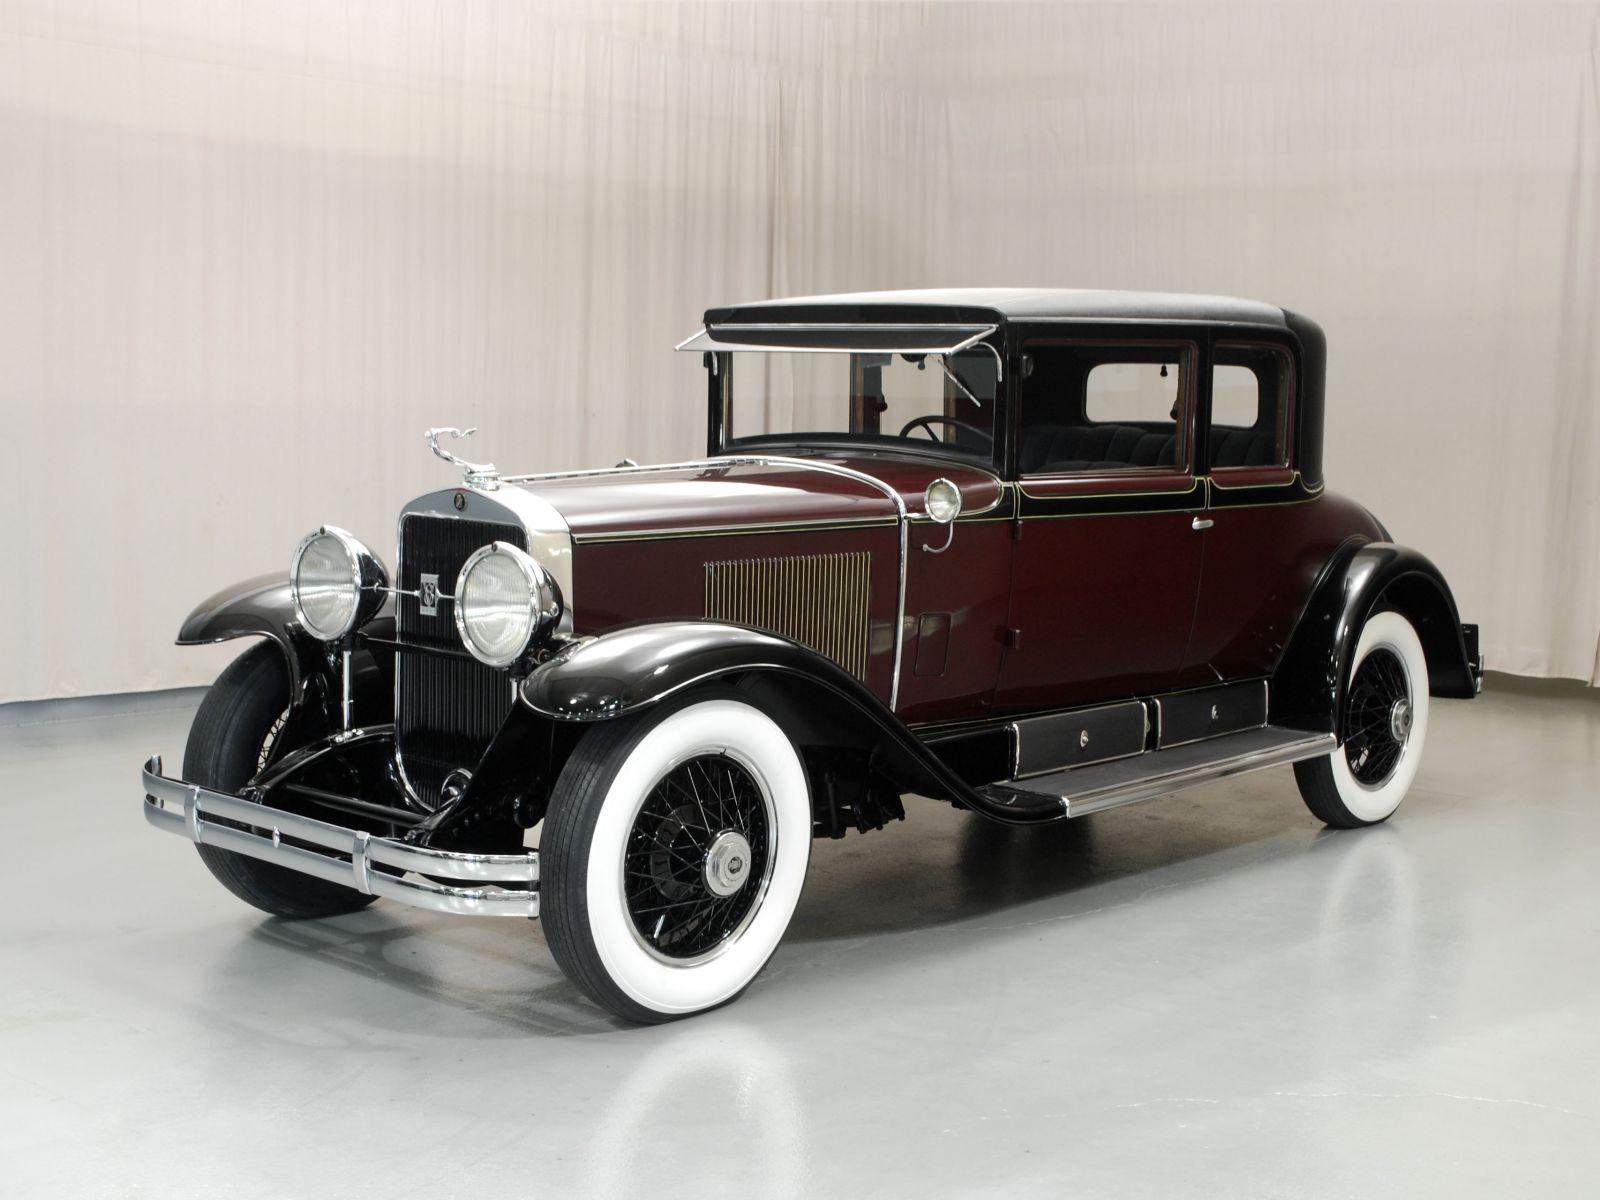 1928 Cadillac Classic Cars Hyman Ltd